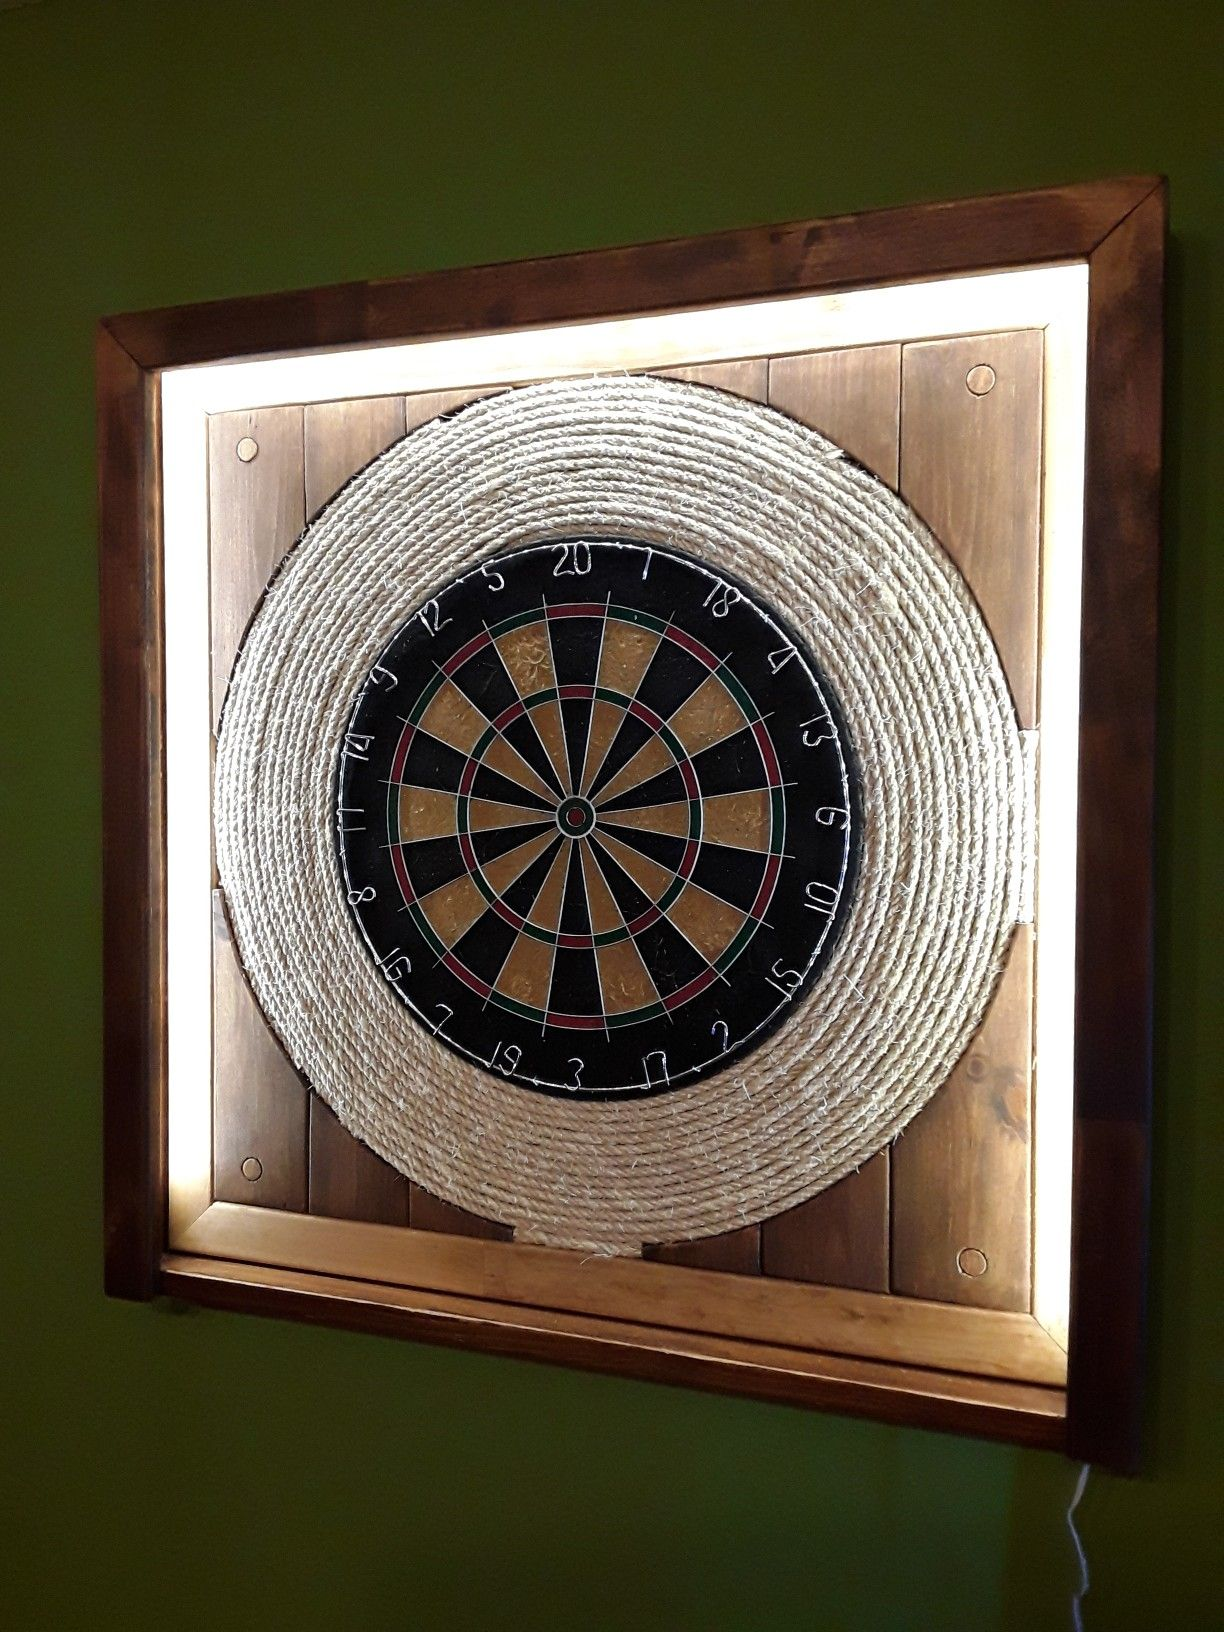 Darts L Dart Board Game Room Decor Diy For Men